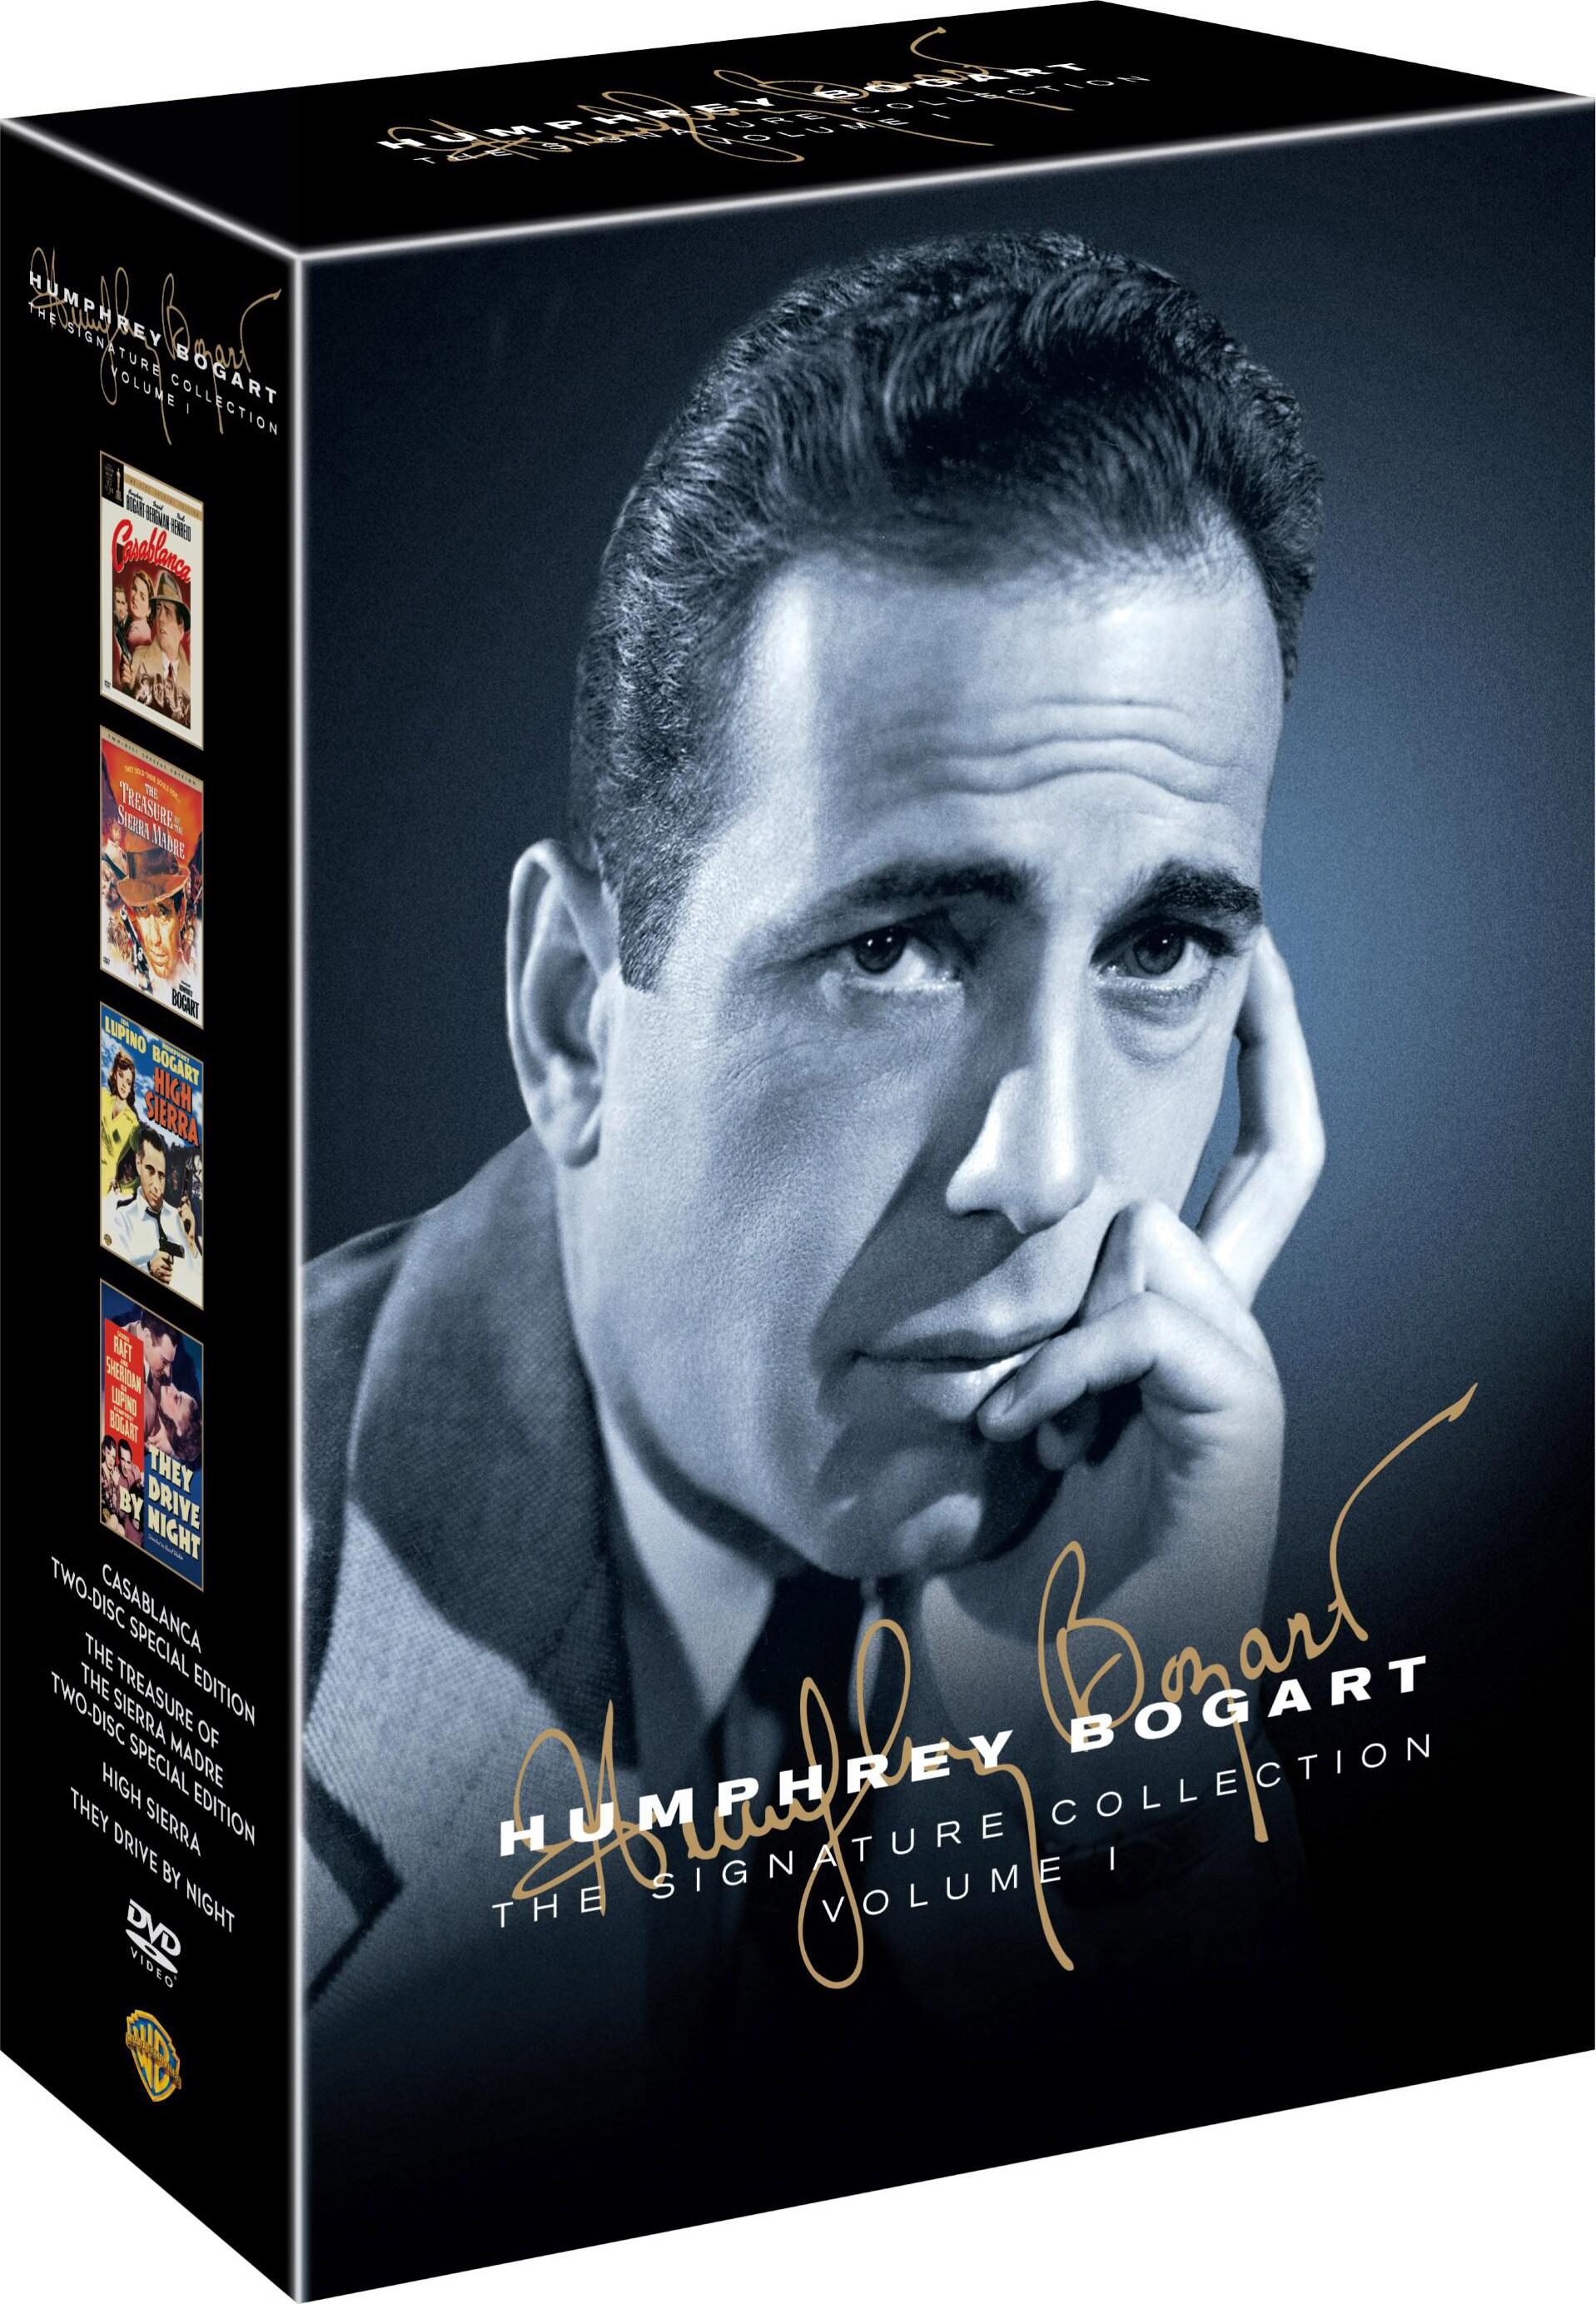 The Humphrey Bogart Signature Collection Vol. 1 (DVD)